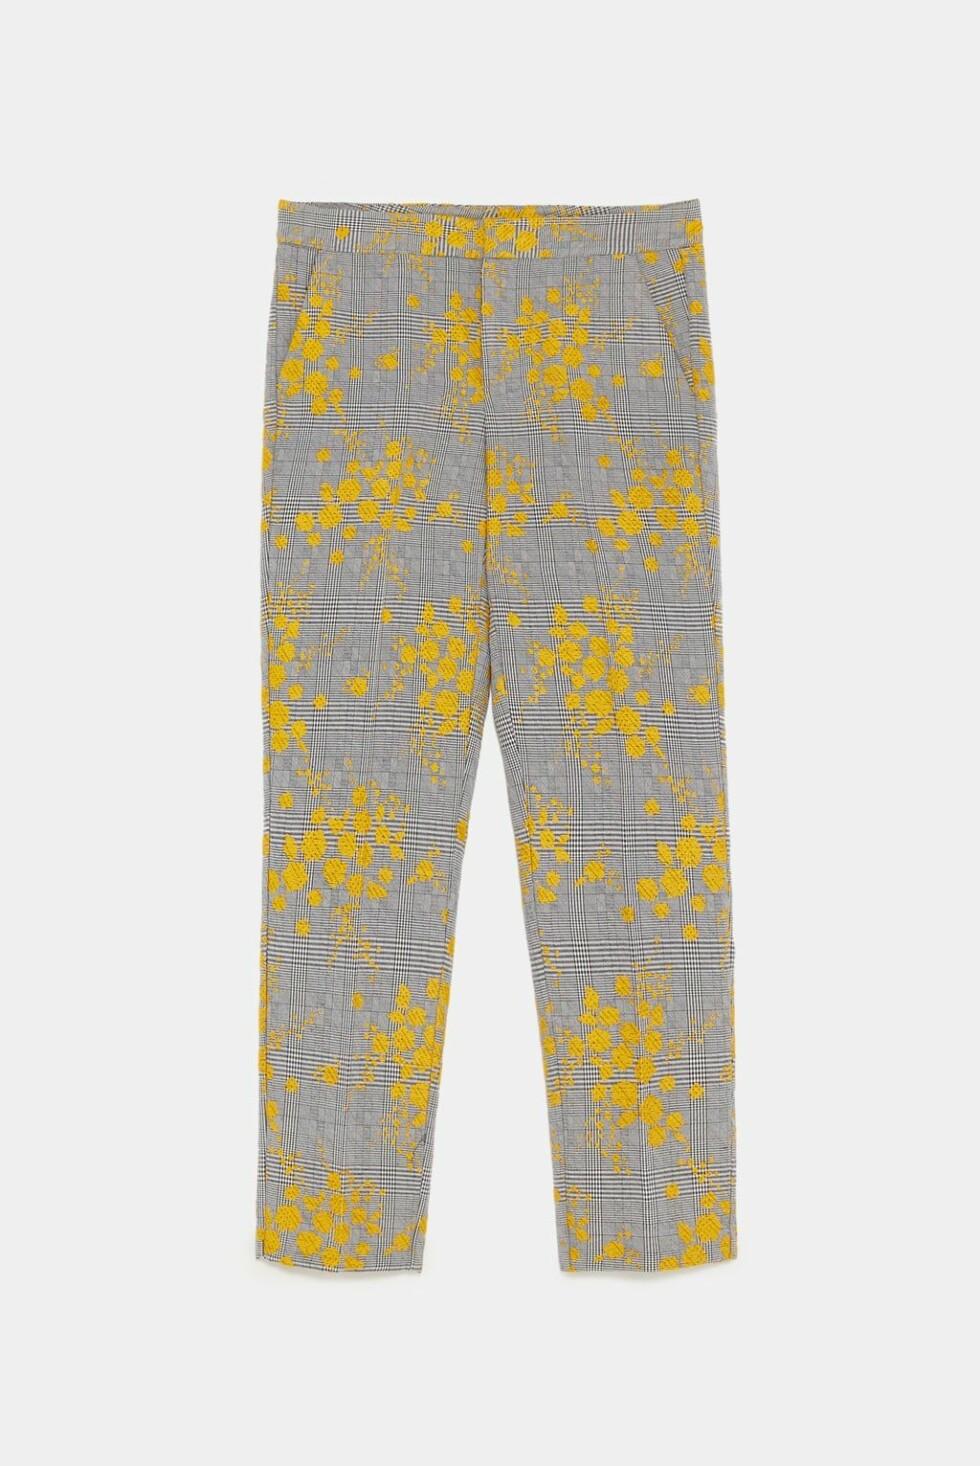 <strong>Gul, mønstrete bukse fra Zara  400,-  https:</strong>//www.zara.com/no/no/jacquardbukse-p04387234.html?v1=6454890&v2=1074755